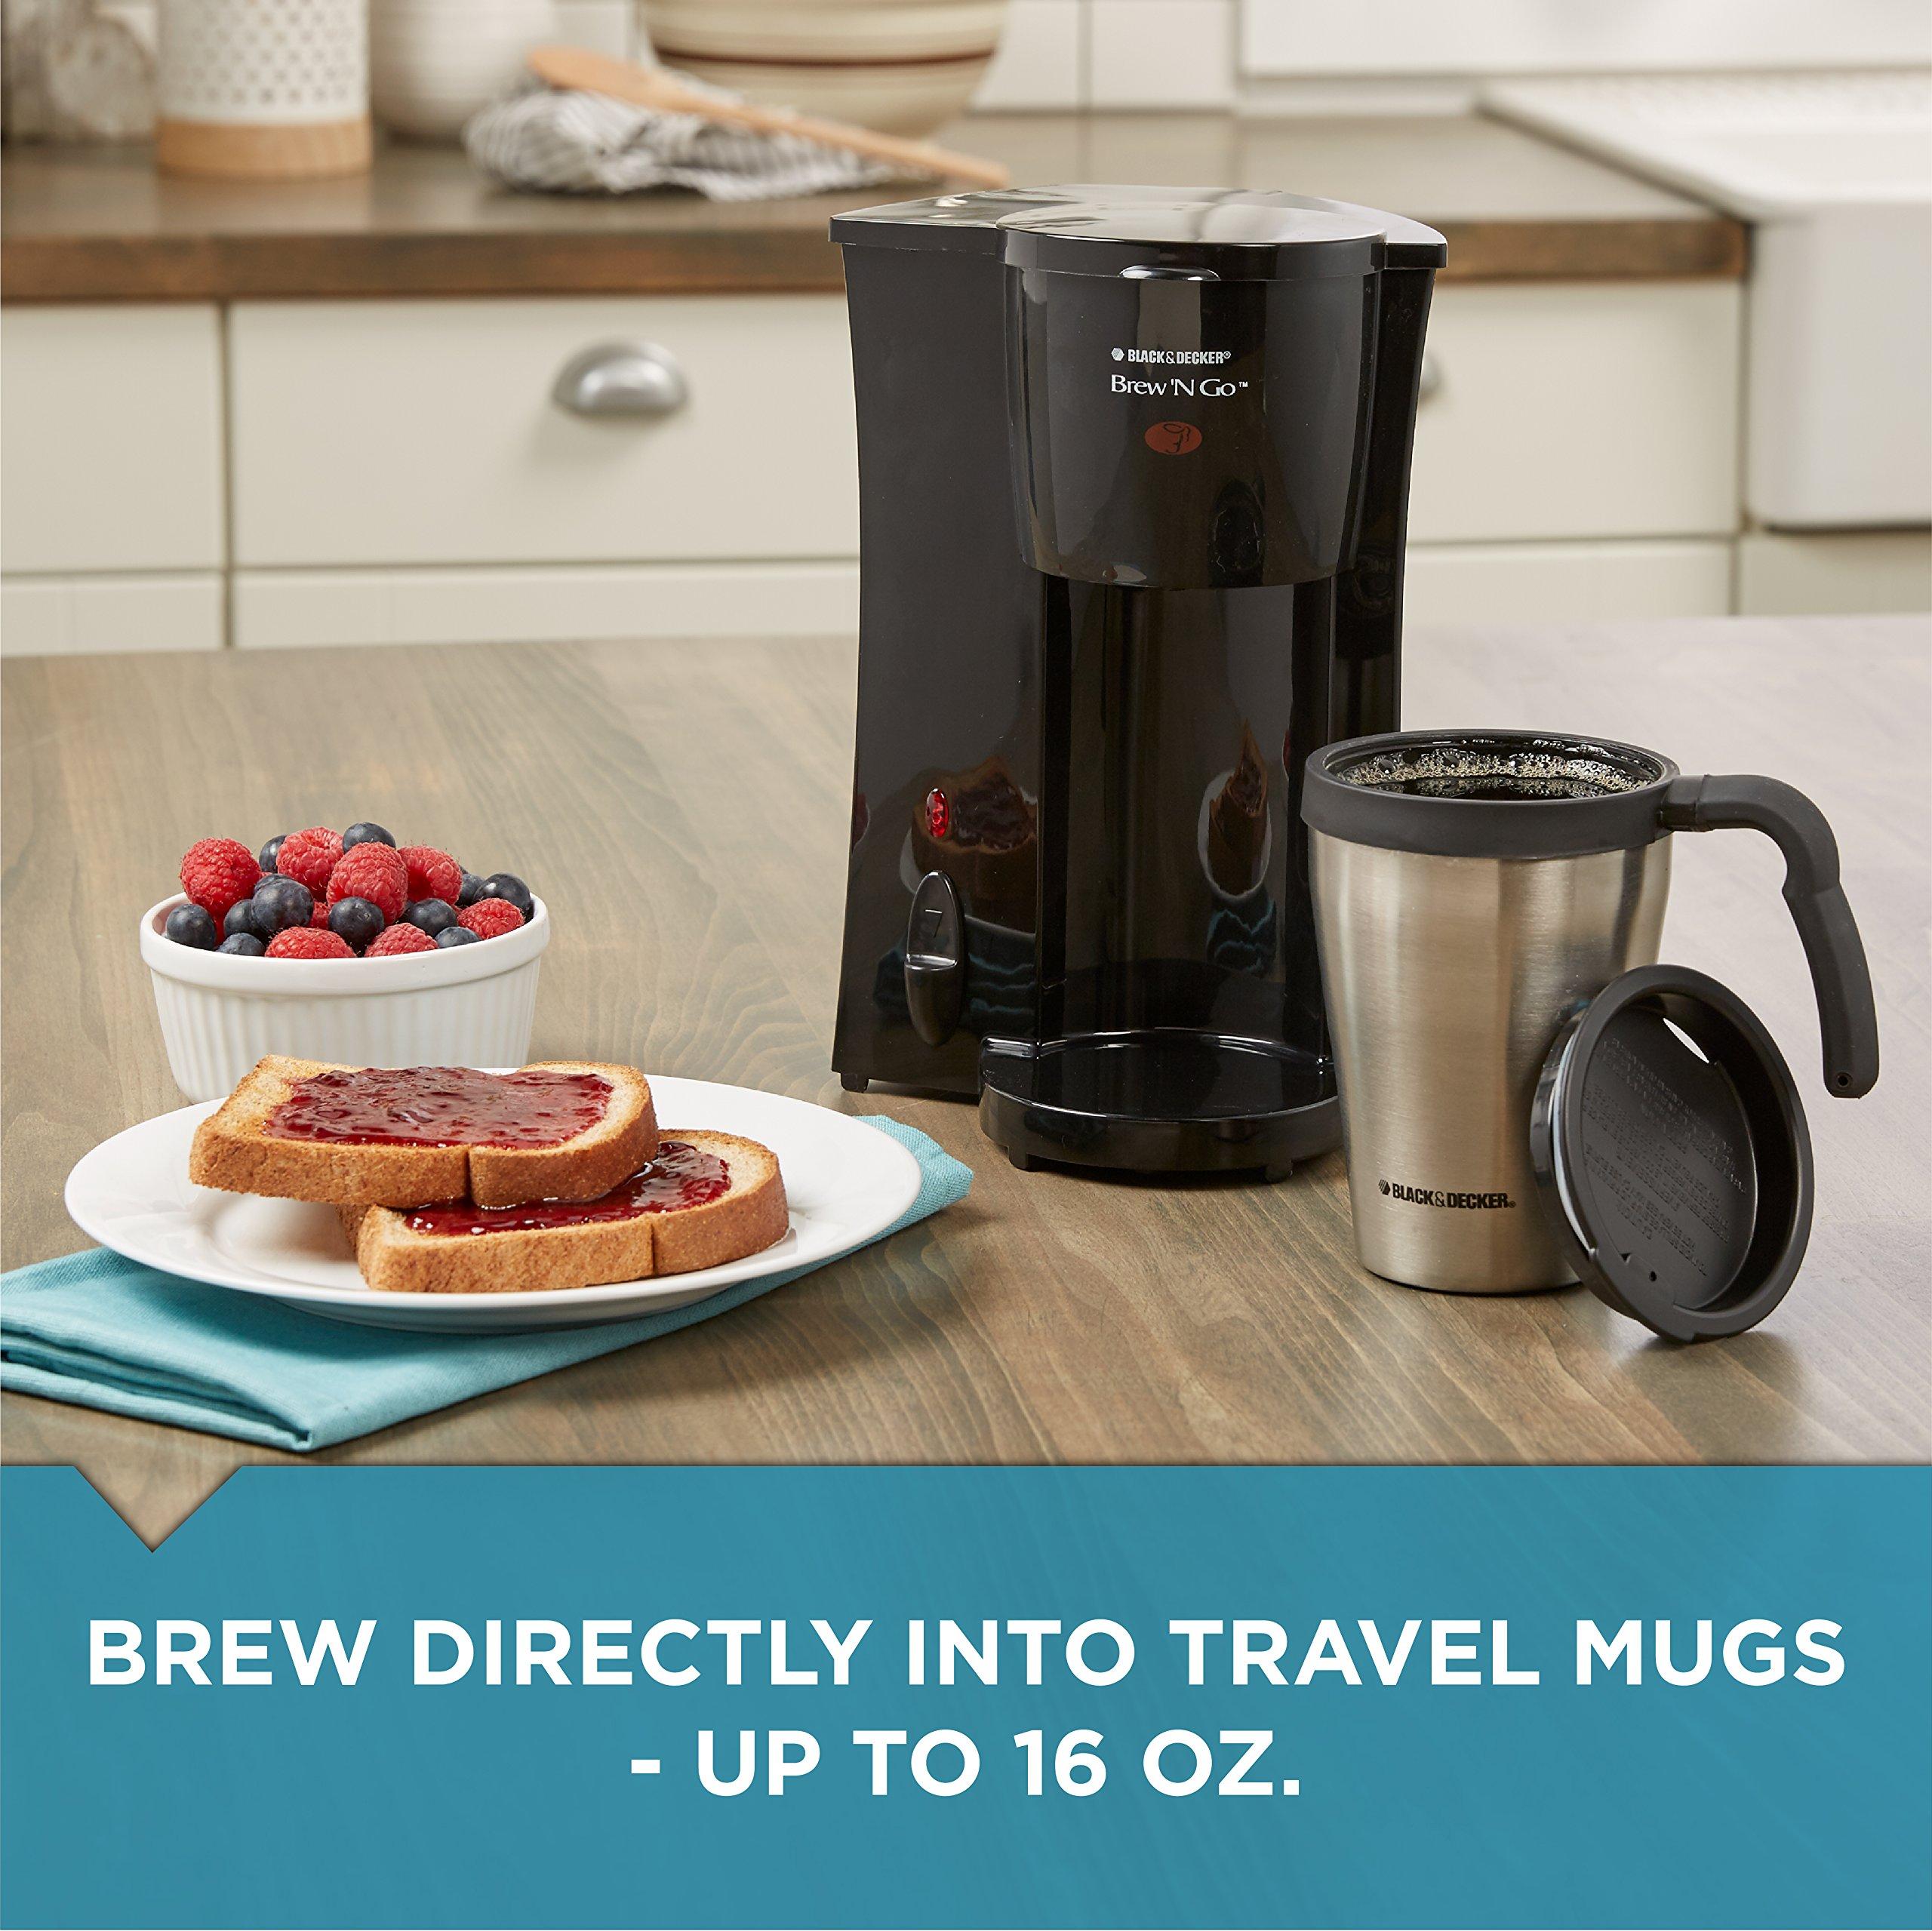 BLACK+DECKER DCM18S Brew 'n Go Personal Coffeemaker with Travel Mug, Black/Stainless Steel by Black & Decker (Image #6)